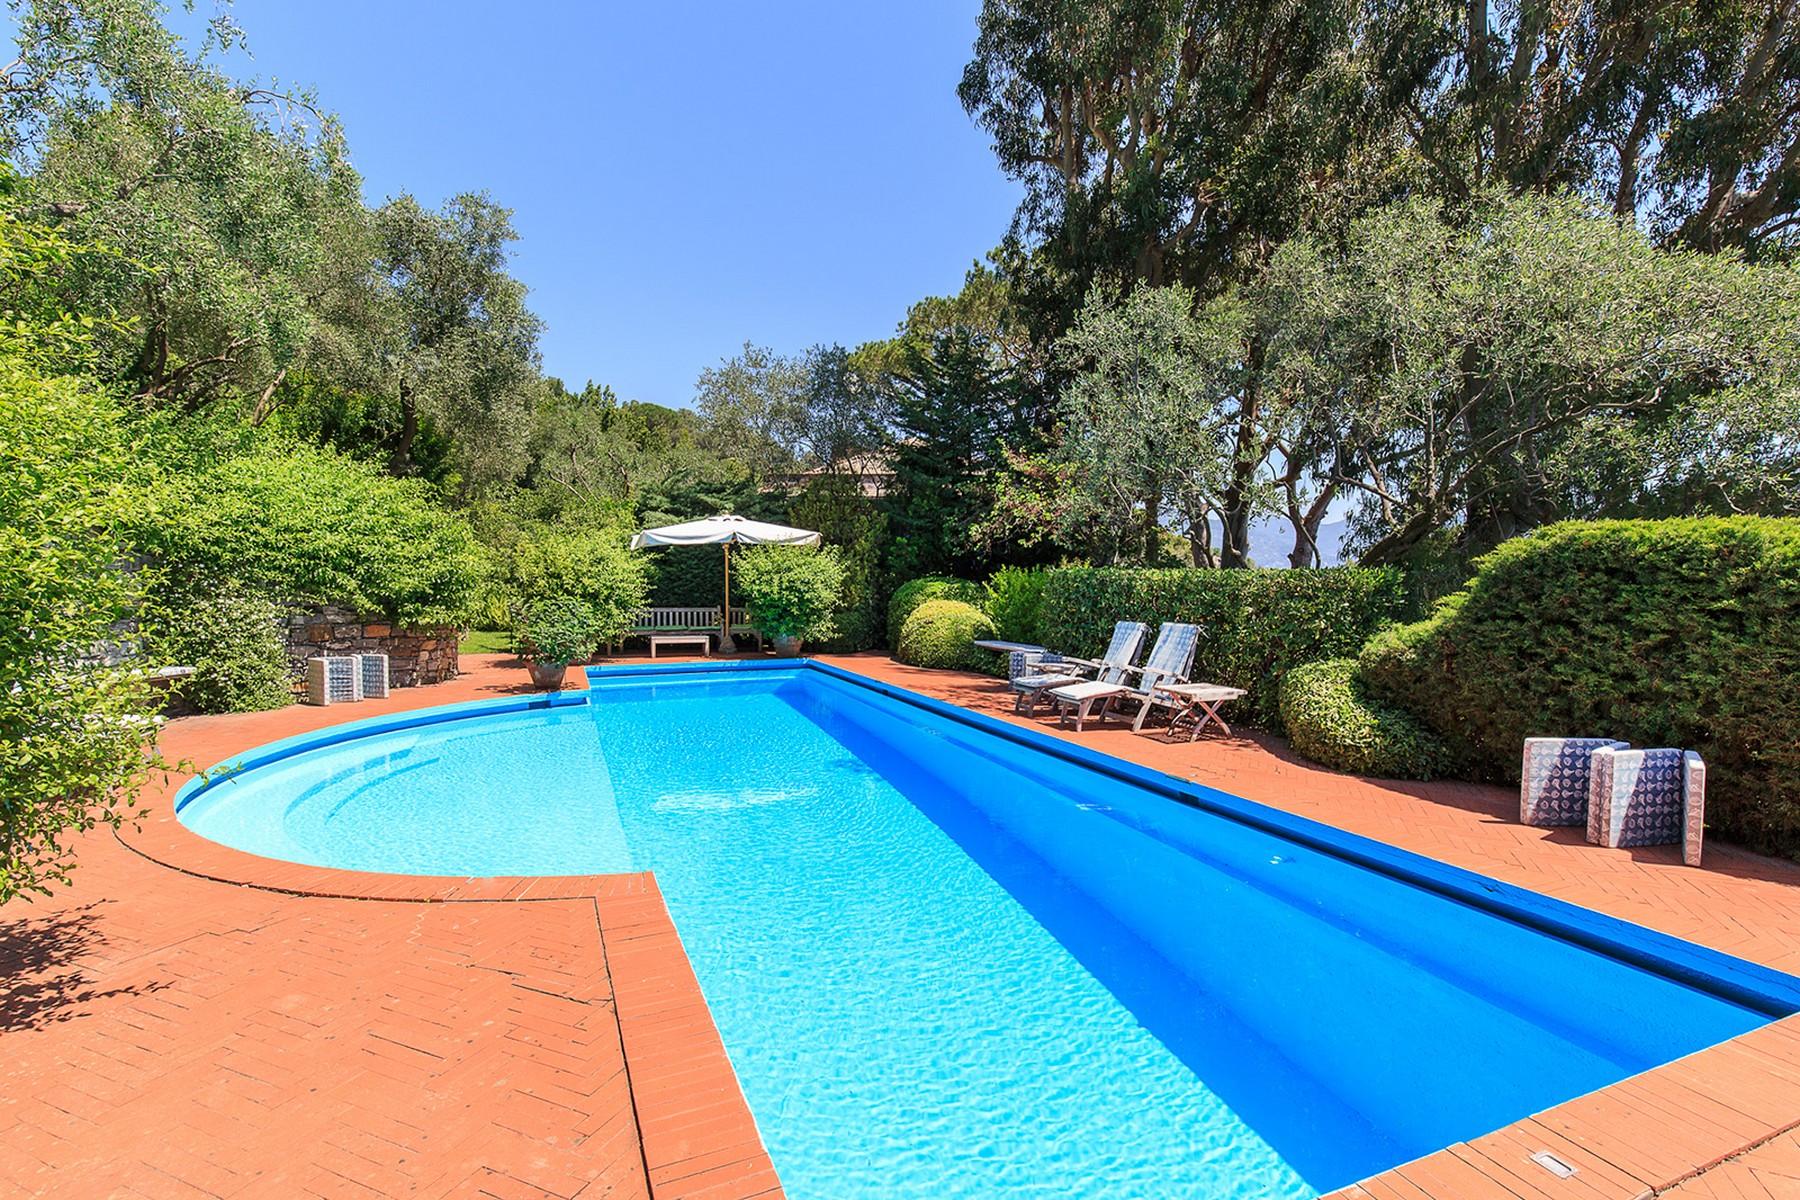 Villa in Vendita a Santa Margherita Ligure: 5 locali, 440 mq - Foto 21